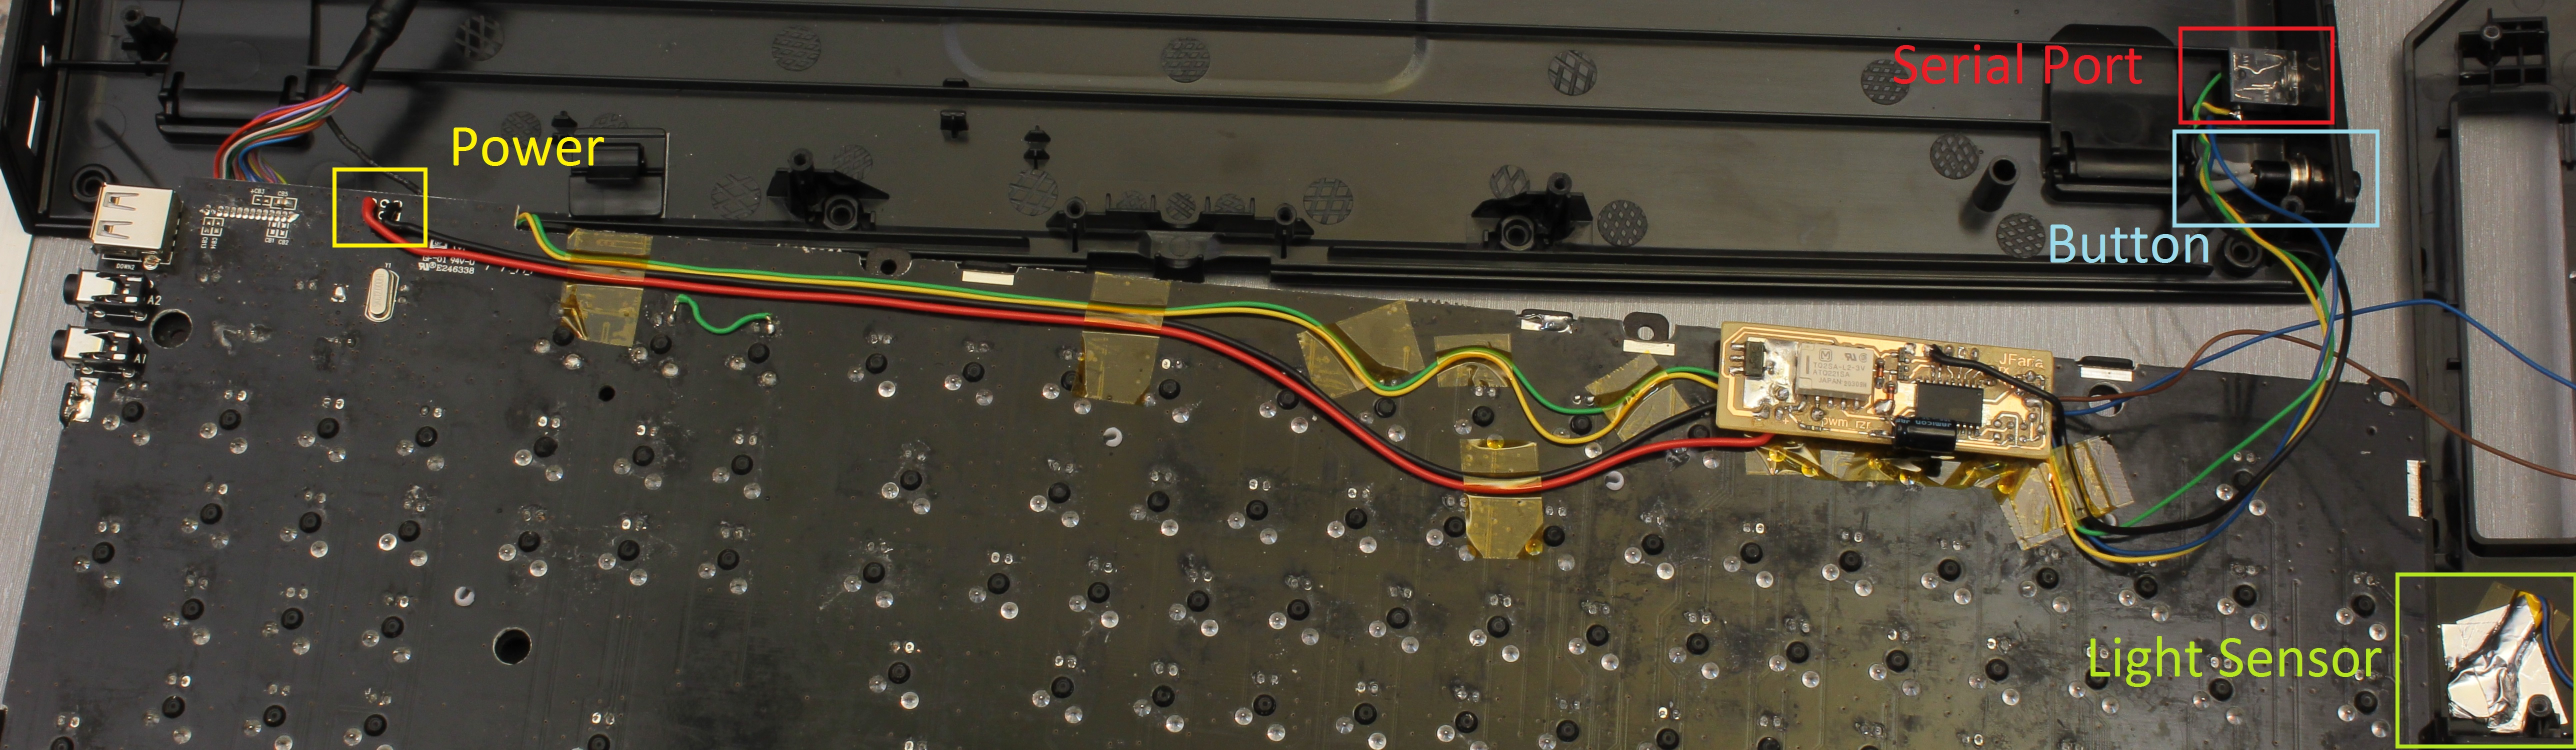 Razer Lycosa Keyboard Usb Plug Wiring Diagram Auto Electrical Victory Cross Country